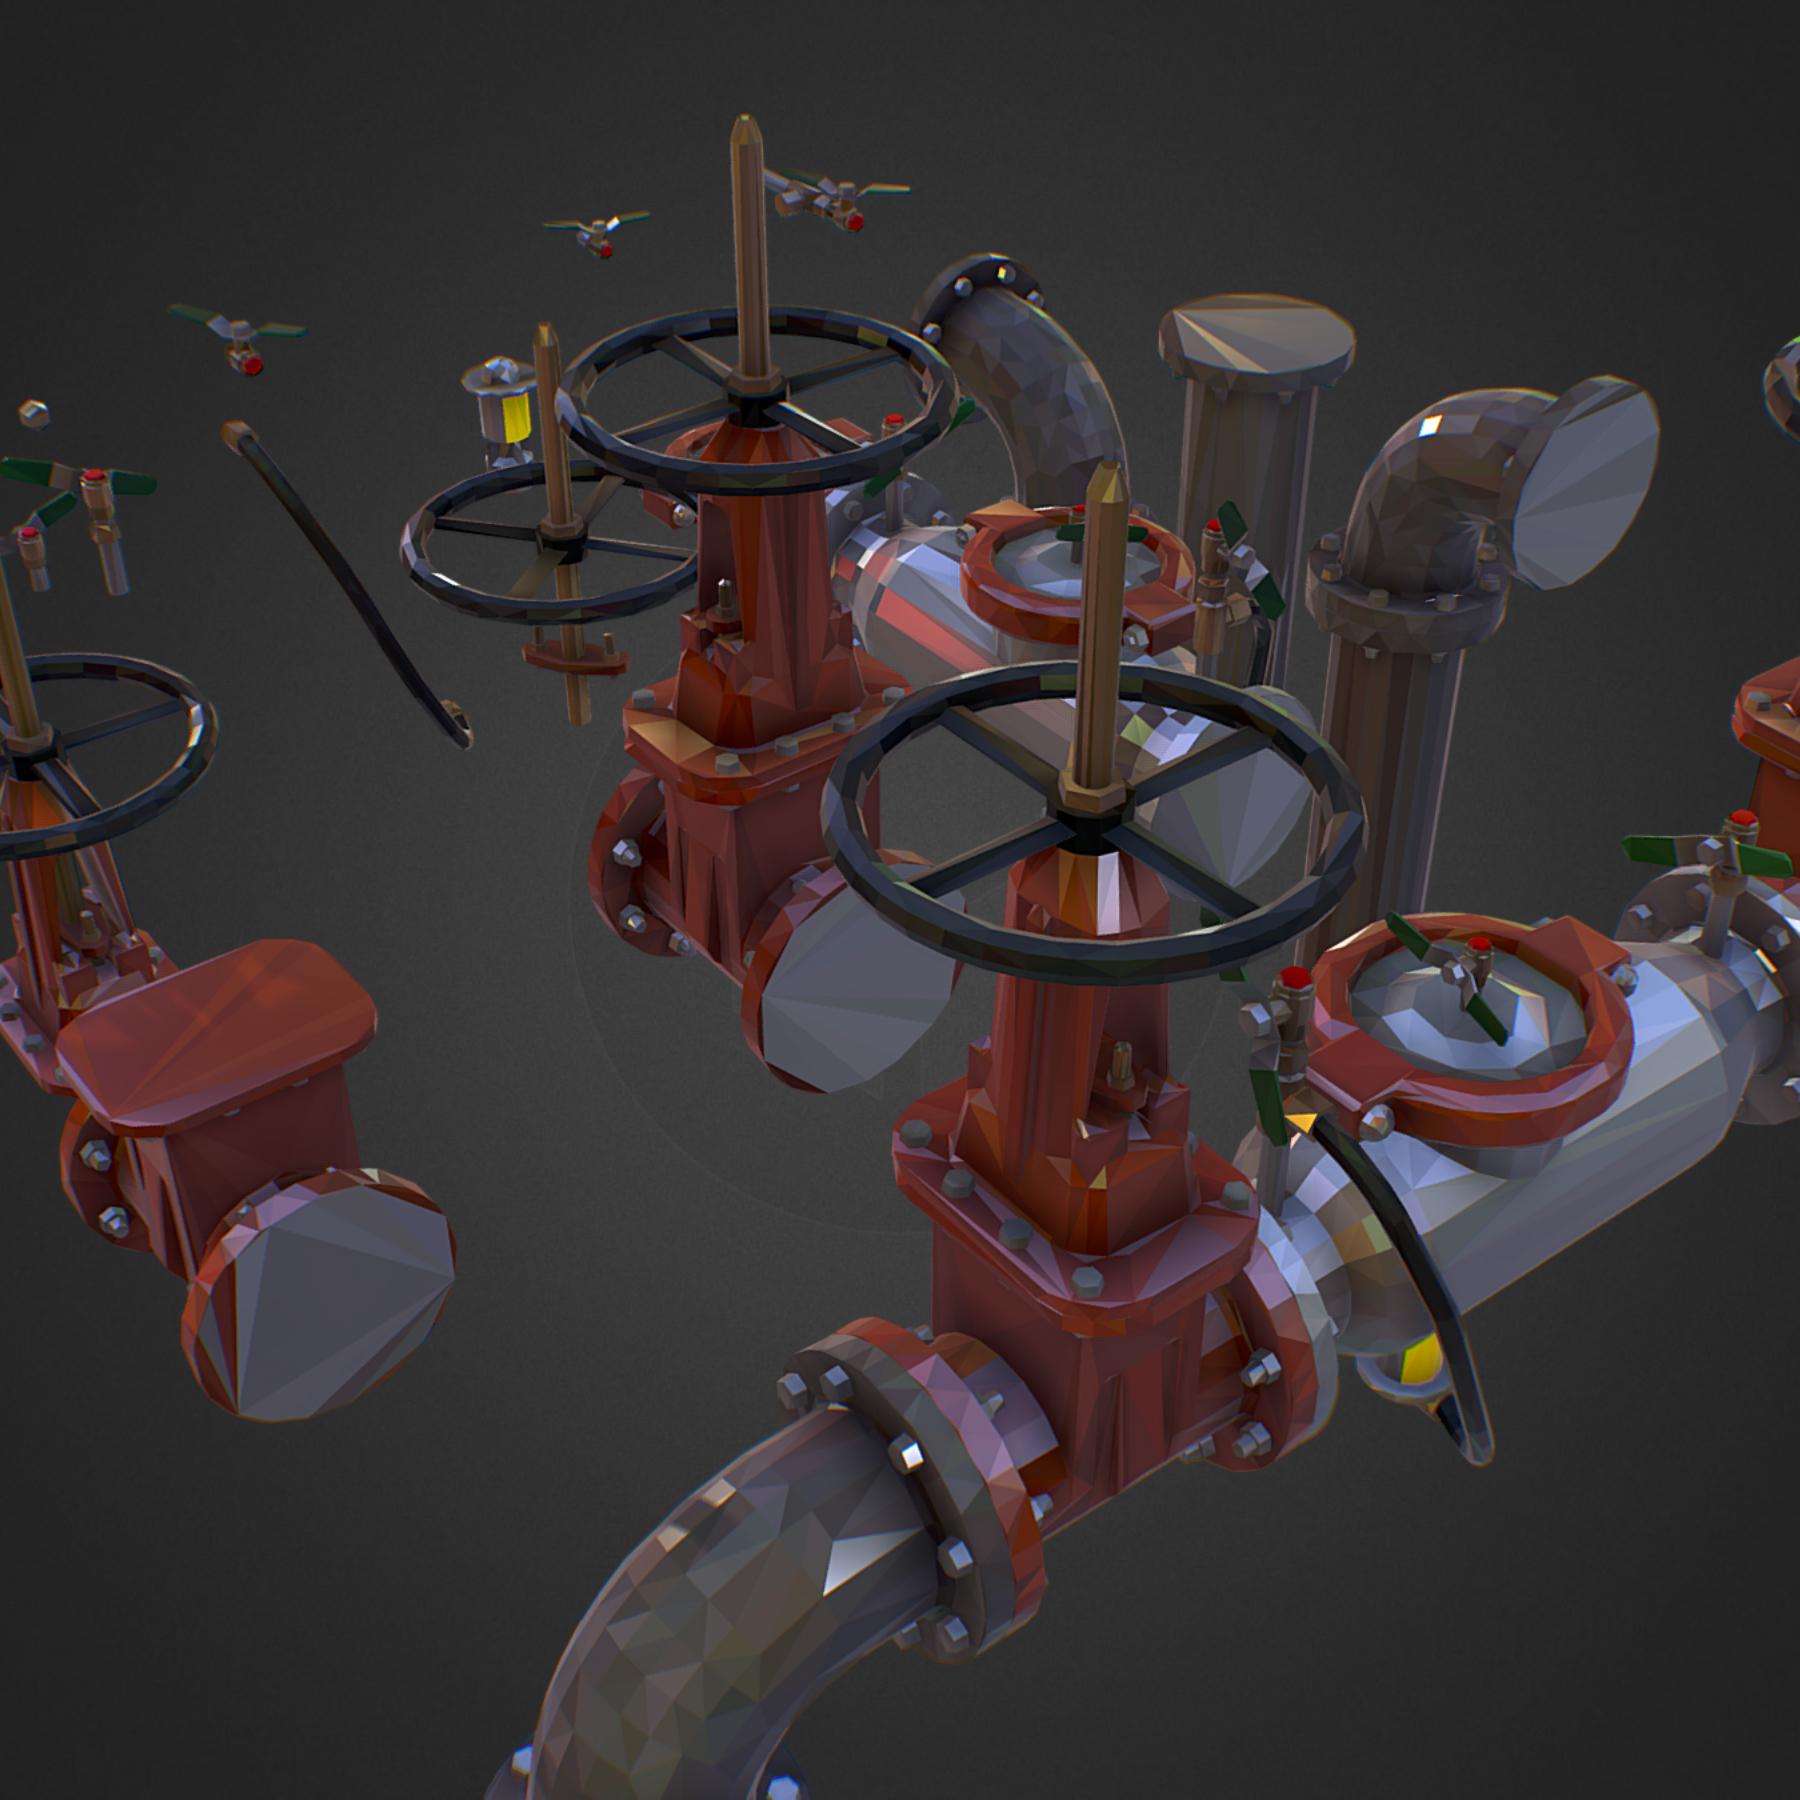 Low Poly ART Backflow Water Pipe Constructor 3d model max 3ds max plugin fbx ma mb tga targa icb vda vst pix obj 272542